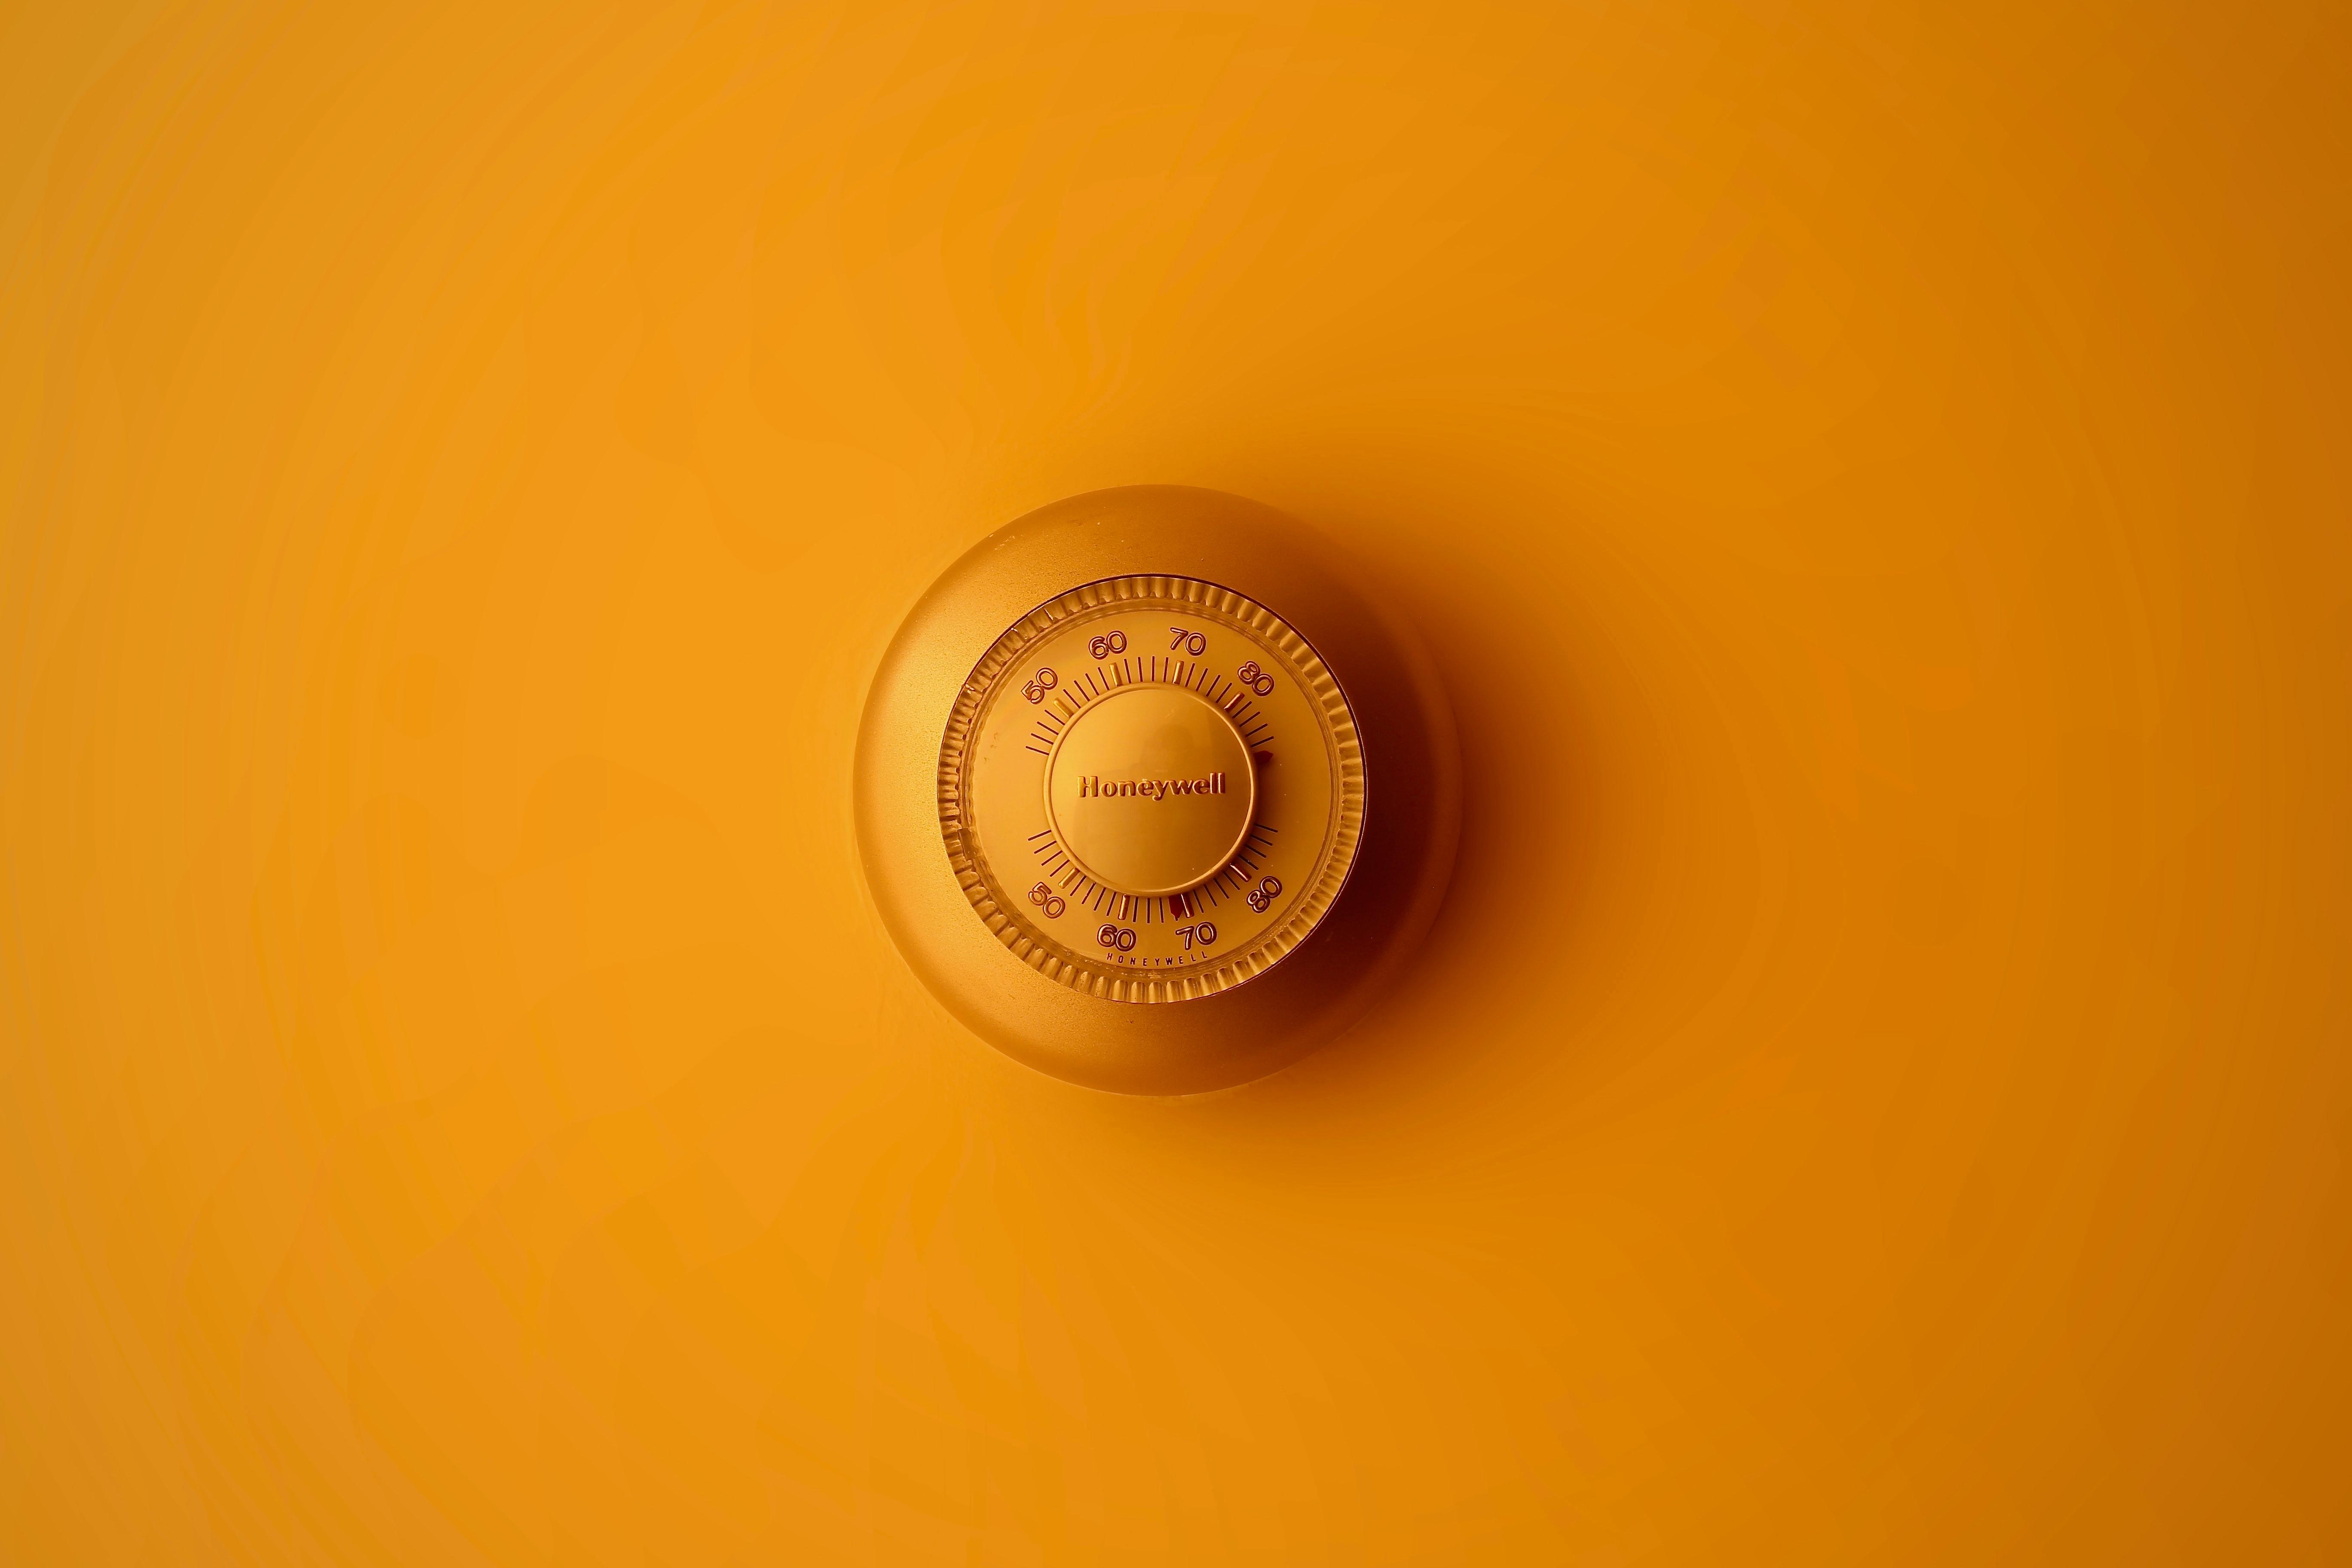 moja msanii vO9 gal54go unsplash - Sæt fokus på dine termostater